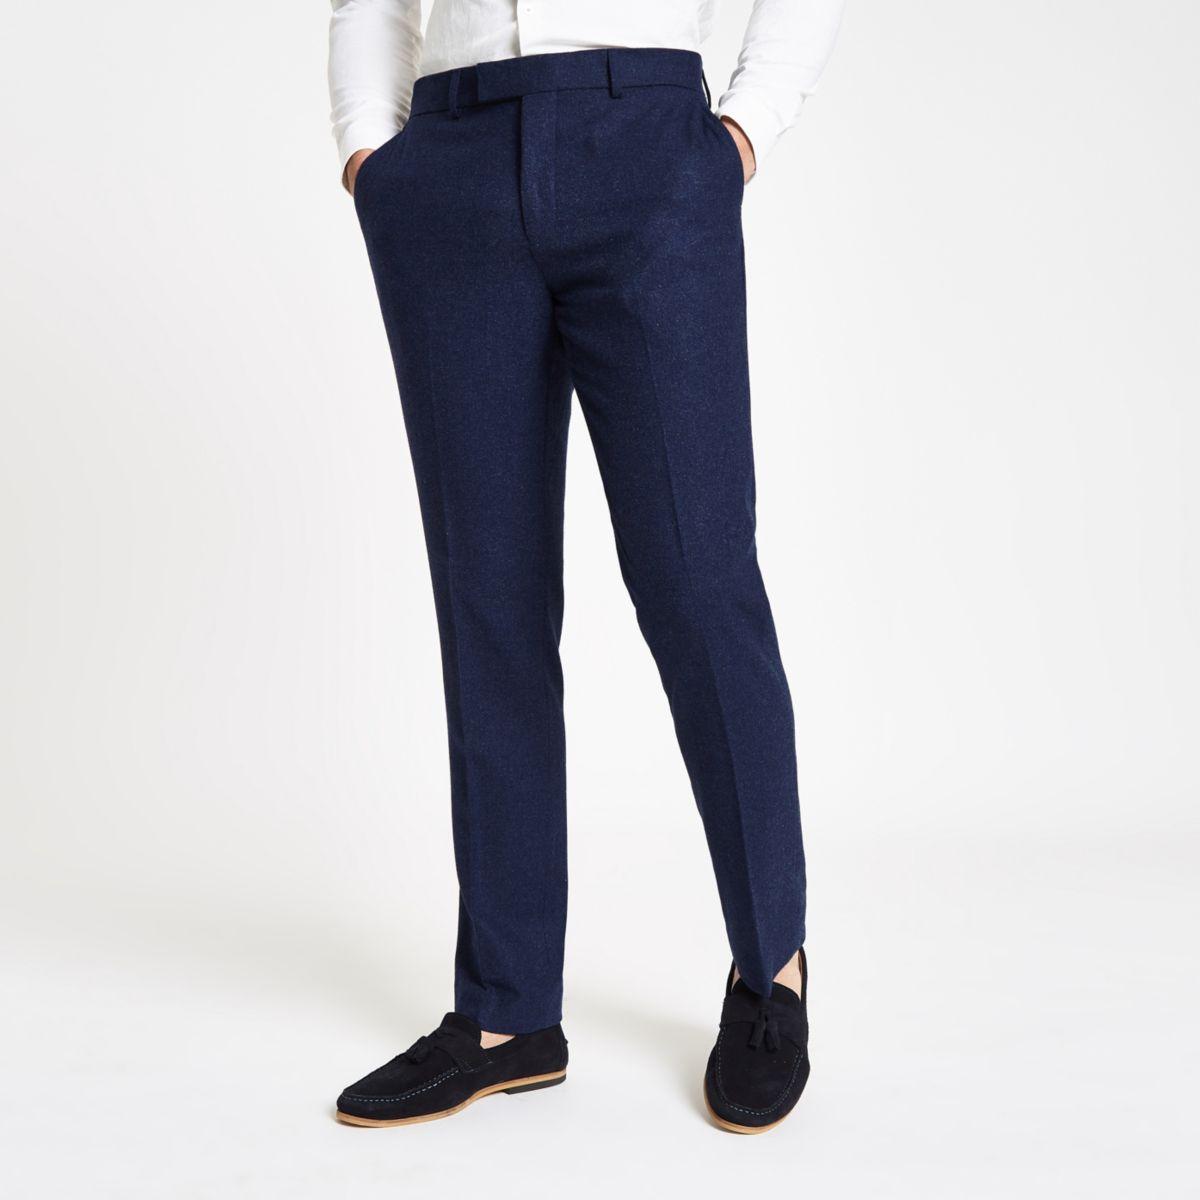 Farah blue wool suit trousers